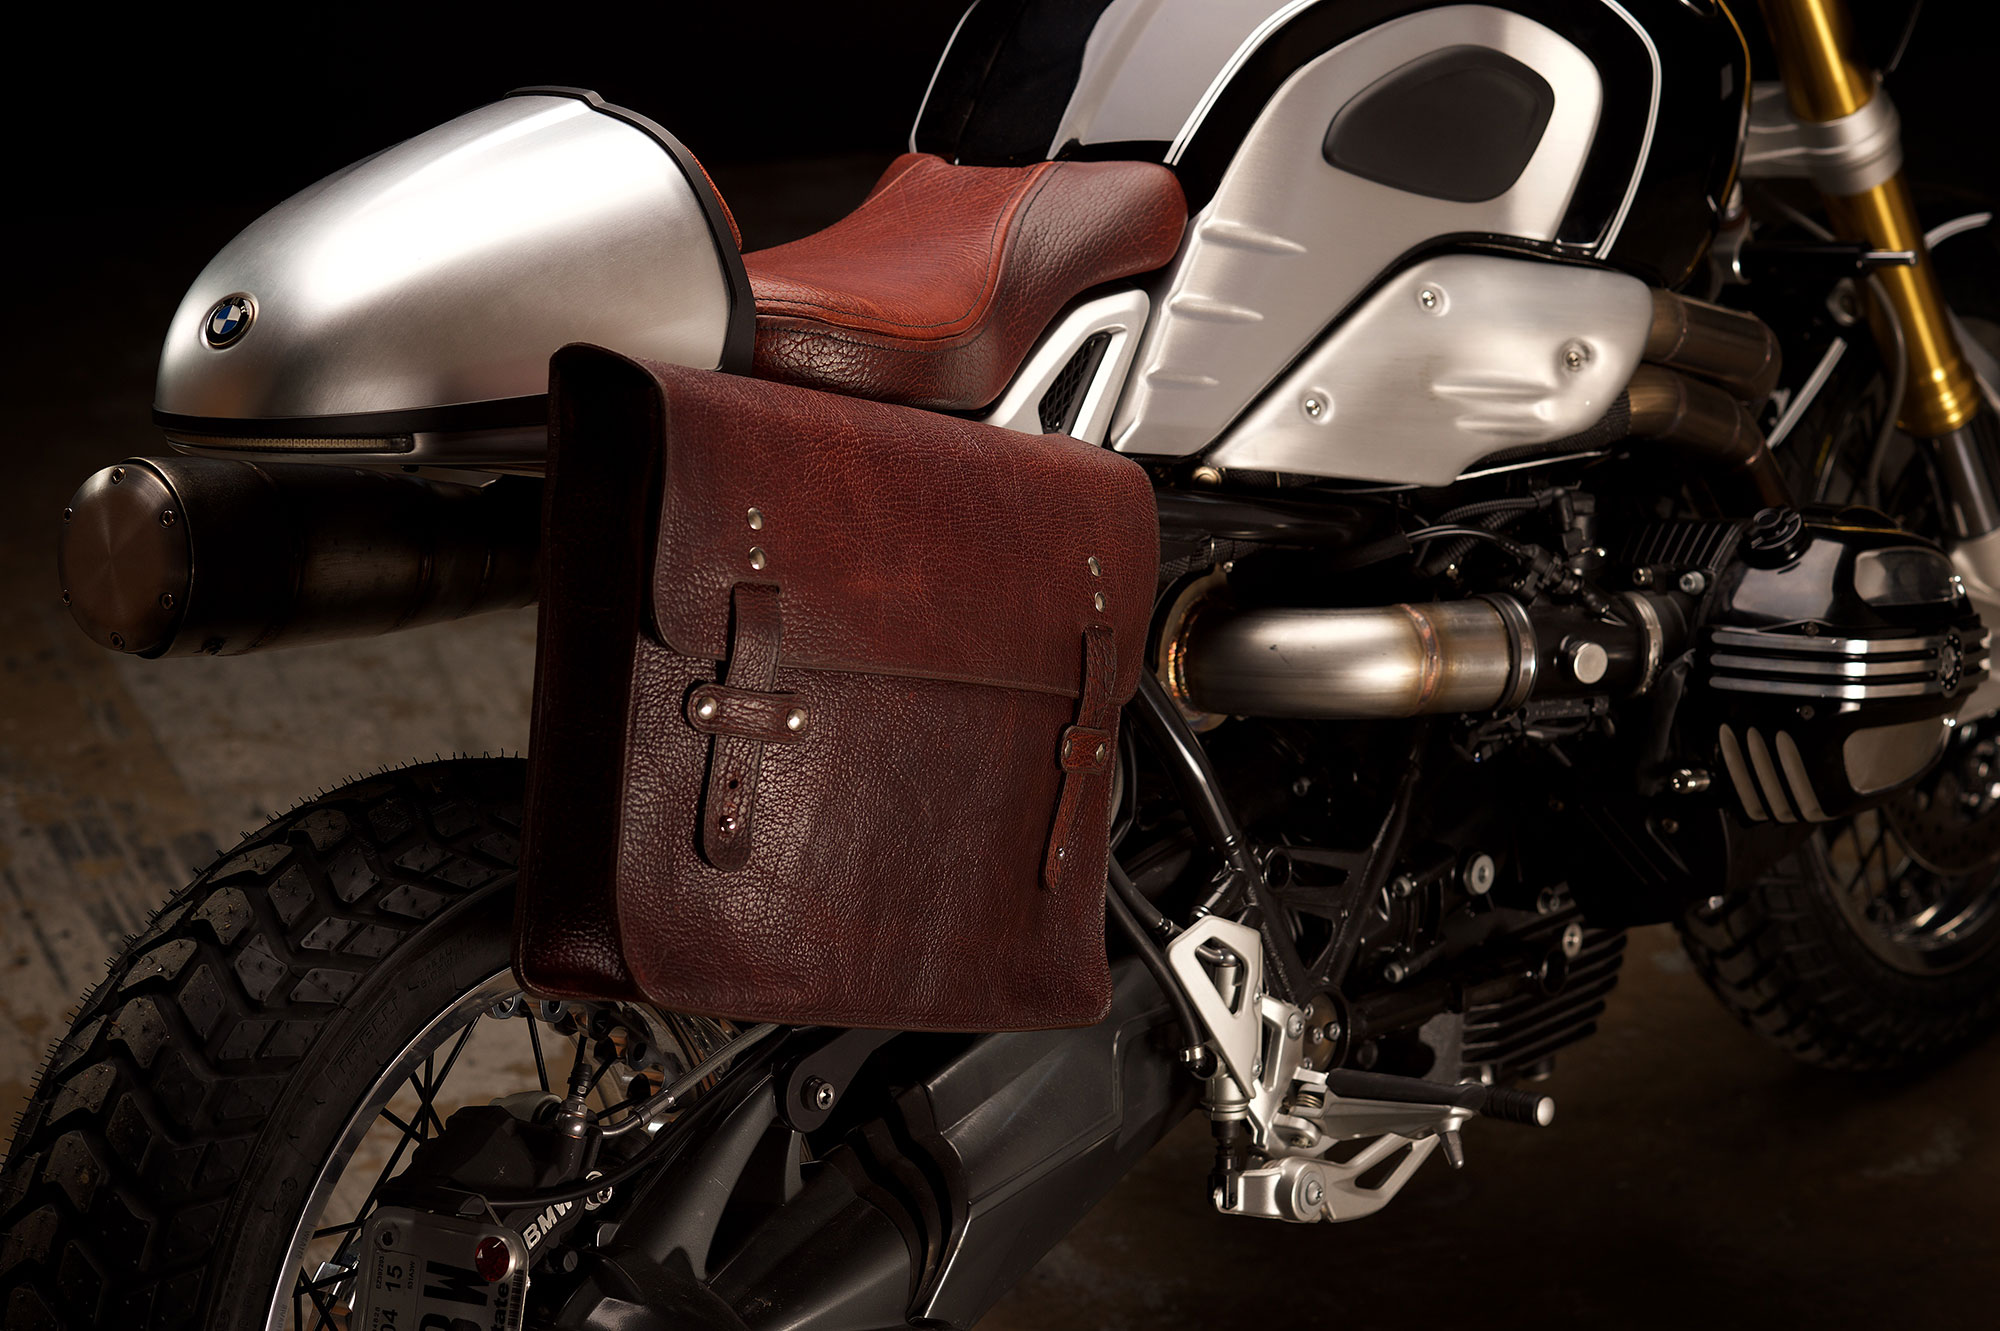 Revival-Cycles-Custom-Build-2014-BMW-RNineT-v2-066-2000w.jpg